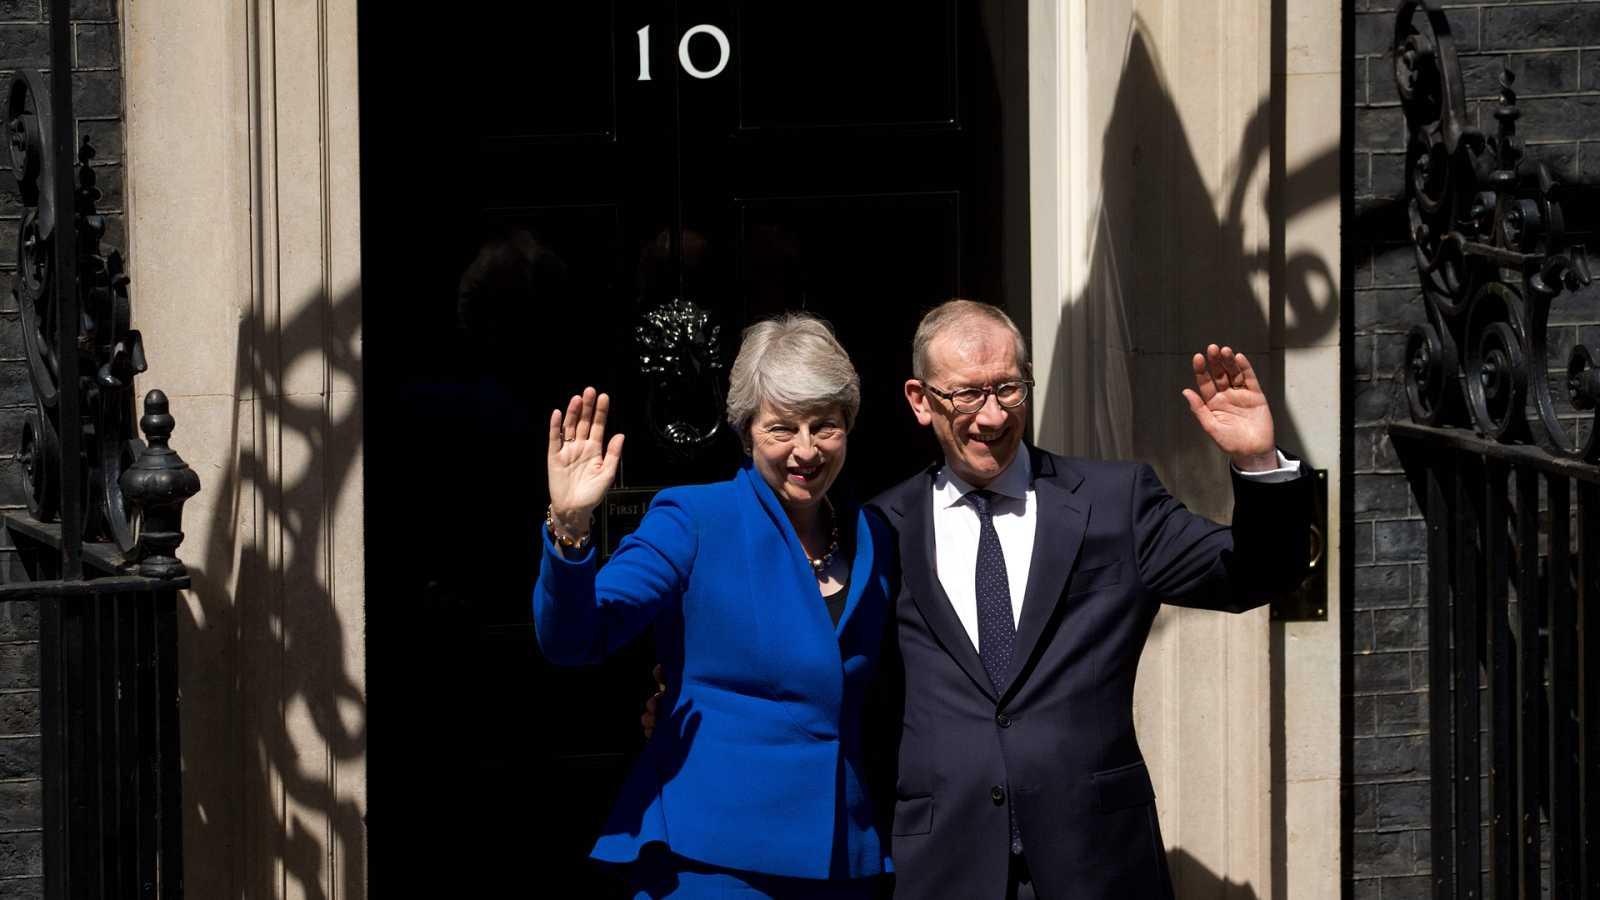 Theresa May deja de ser primer ministra del Reino Unido y da el relevo a Boris Johnson